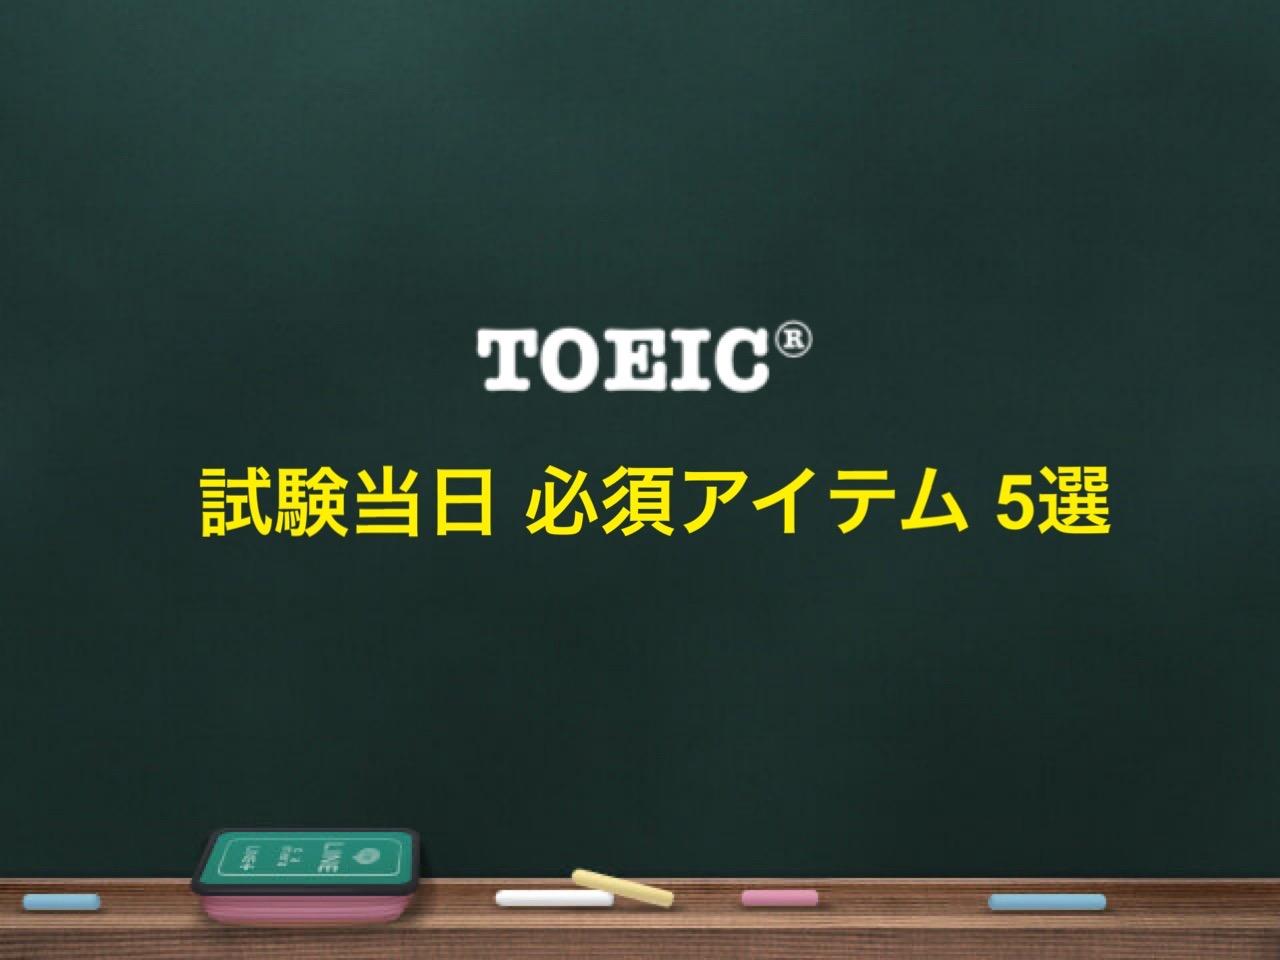 Toeic items